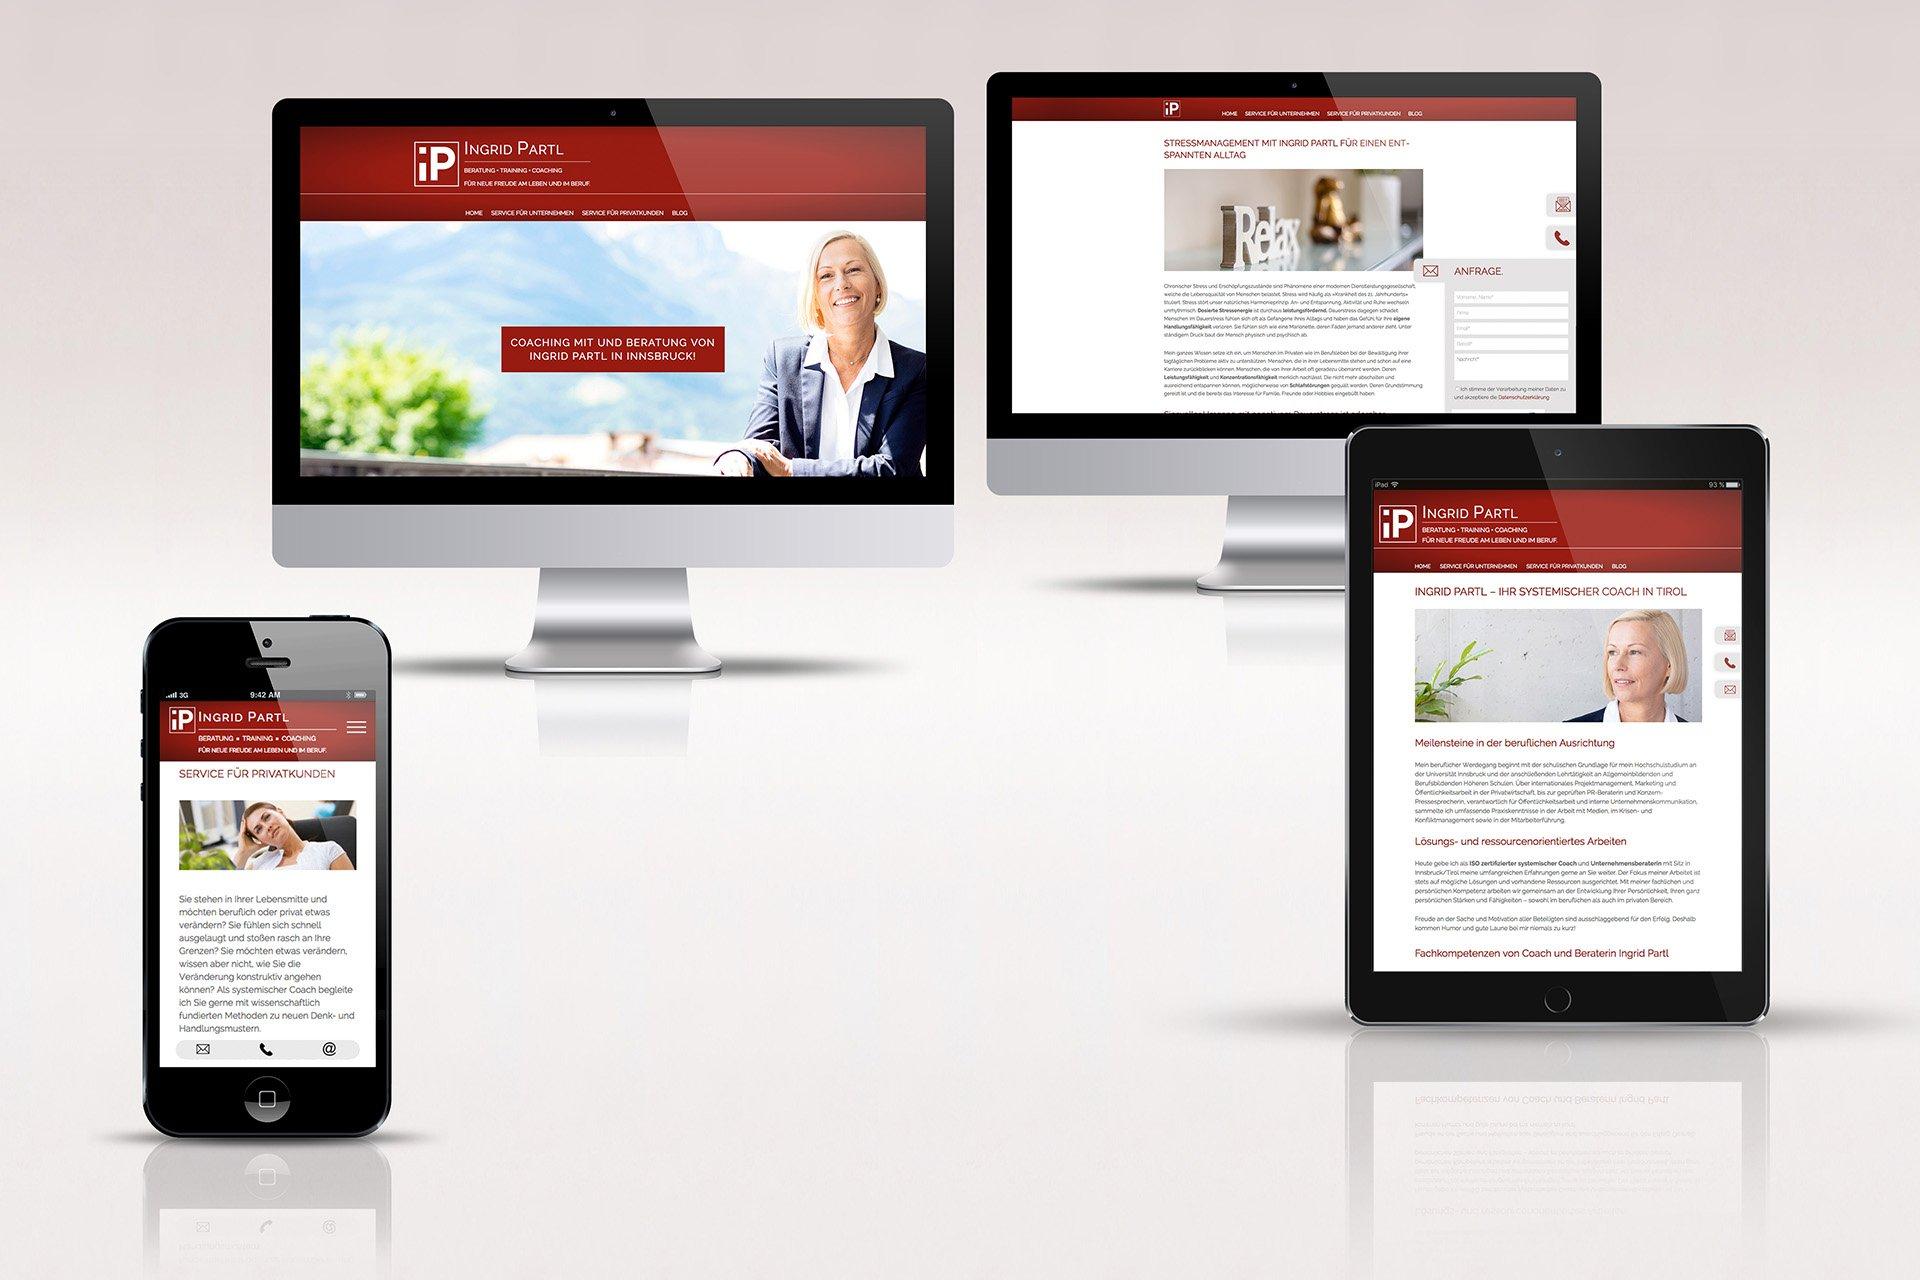 webdesign-Partl